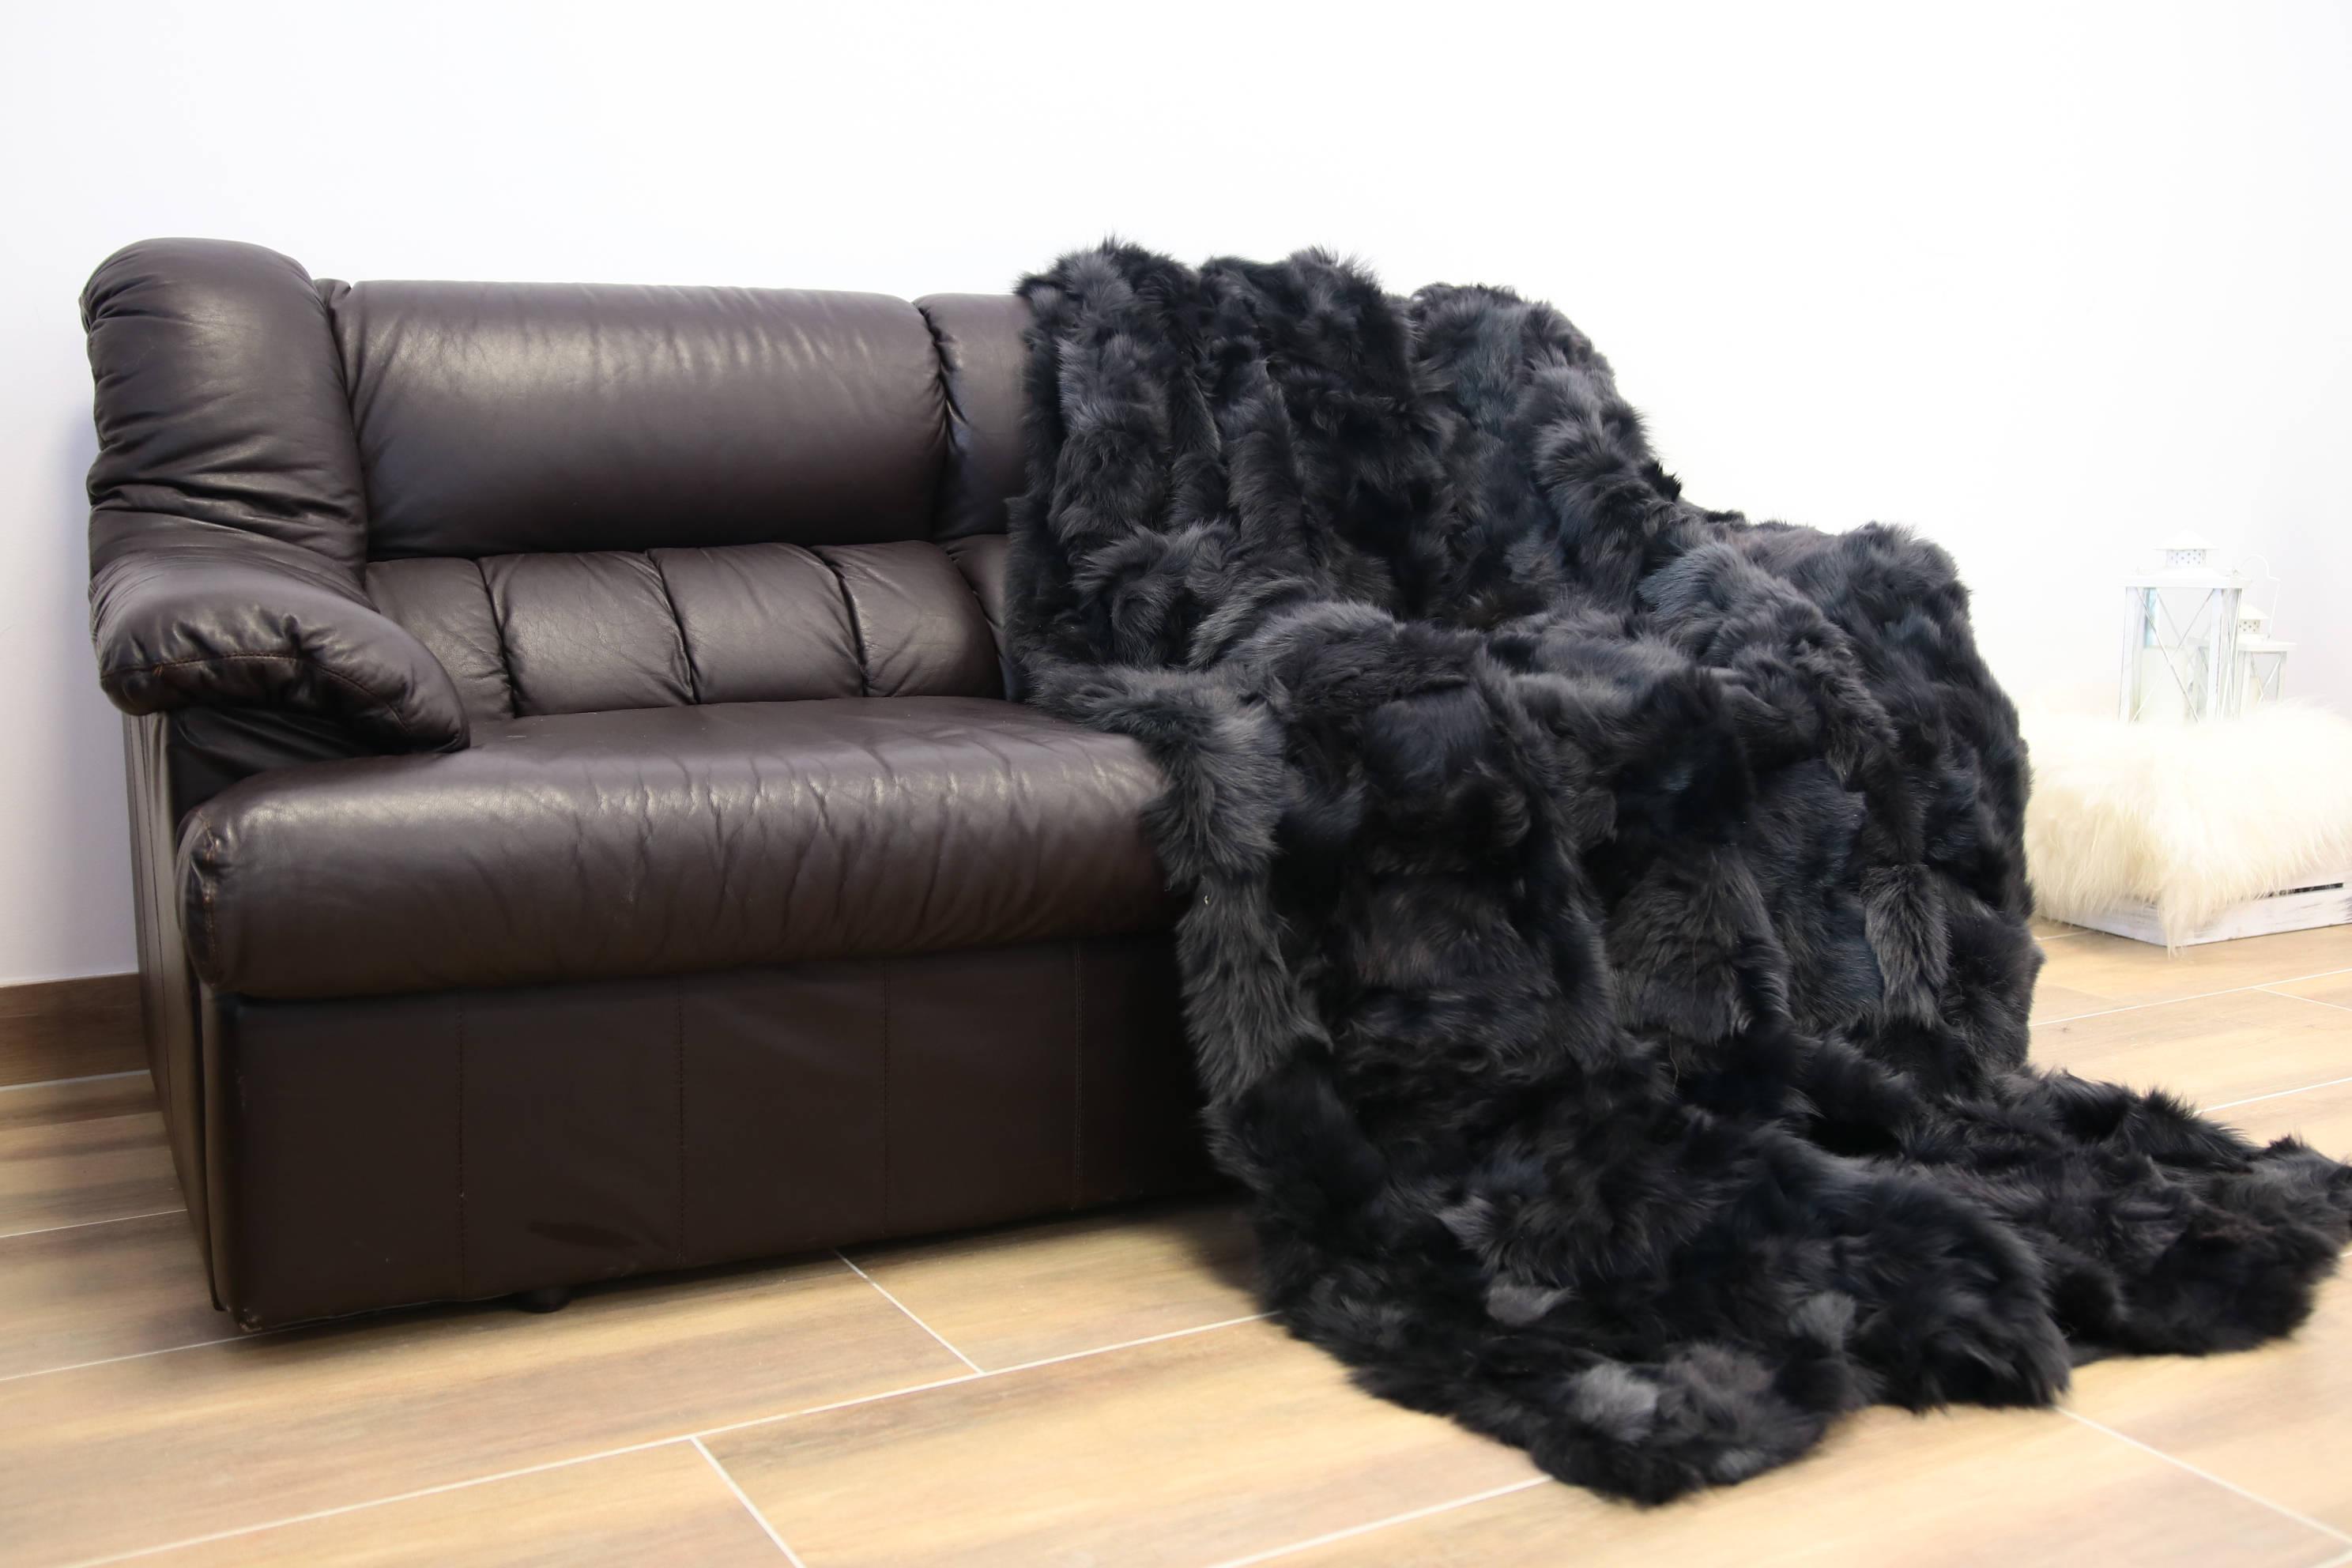 Exclusive Real Sheepskin Toscana Blanket Throw, Fur Sofa Throw,  Scandinavian Decoration, Throws For Sofa, Sofa Throws, Luxury Throws